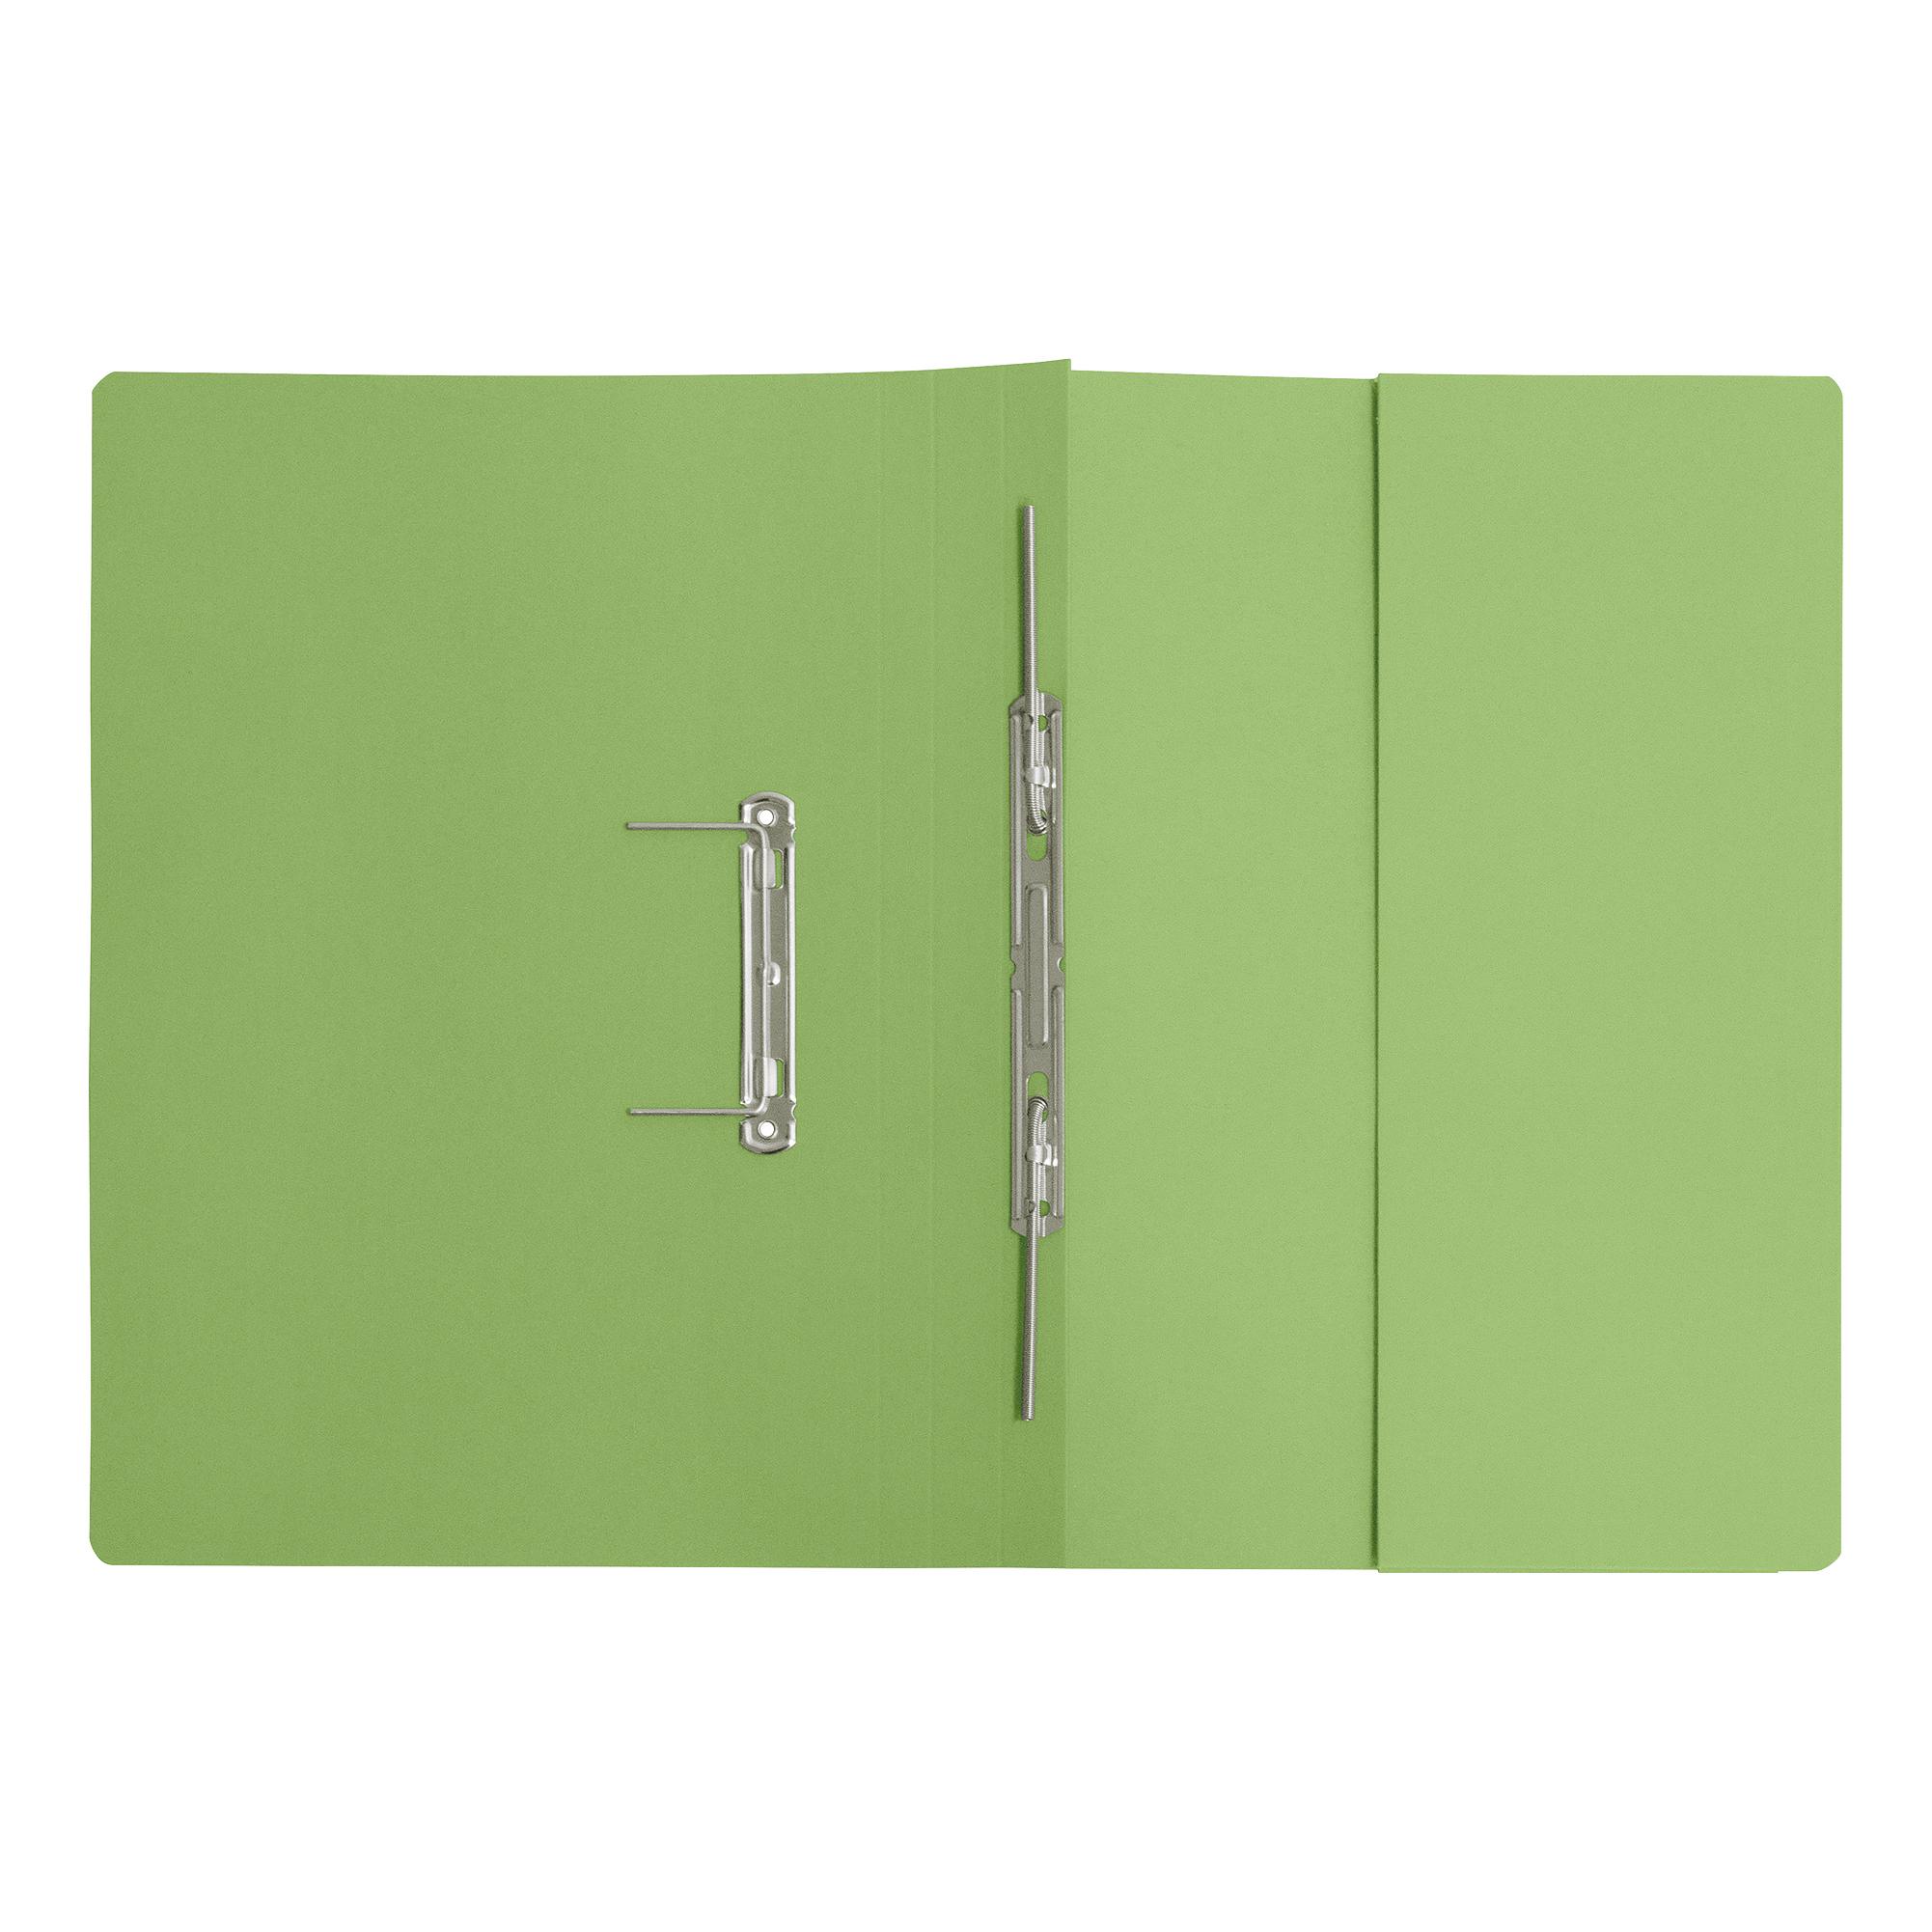 5 Star Elite Transfer Spring Pocket File Super Heavyweight 380gsm Foolscap Green [Pack 25]